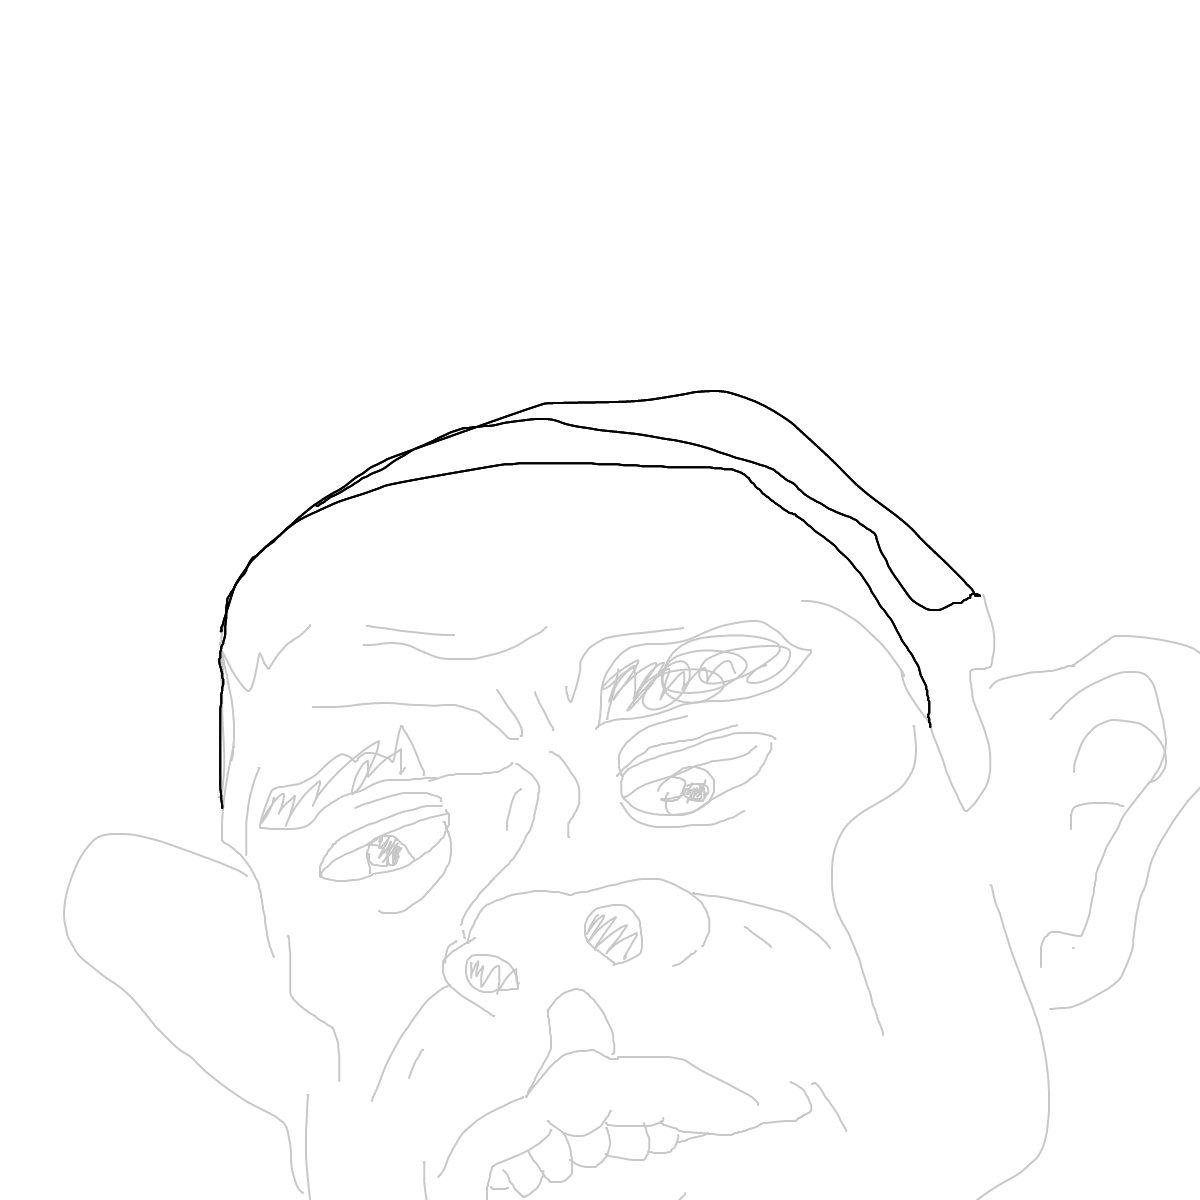 BAAAM drawing#9621 lat:52.4749374389648440lng: 13.4068374633789060